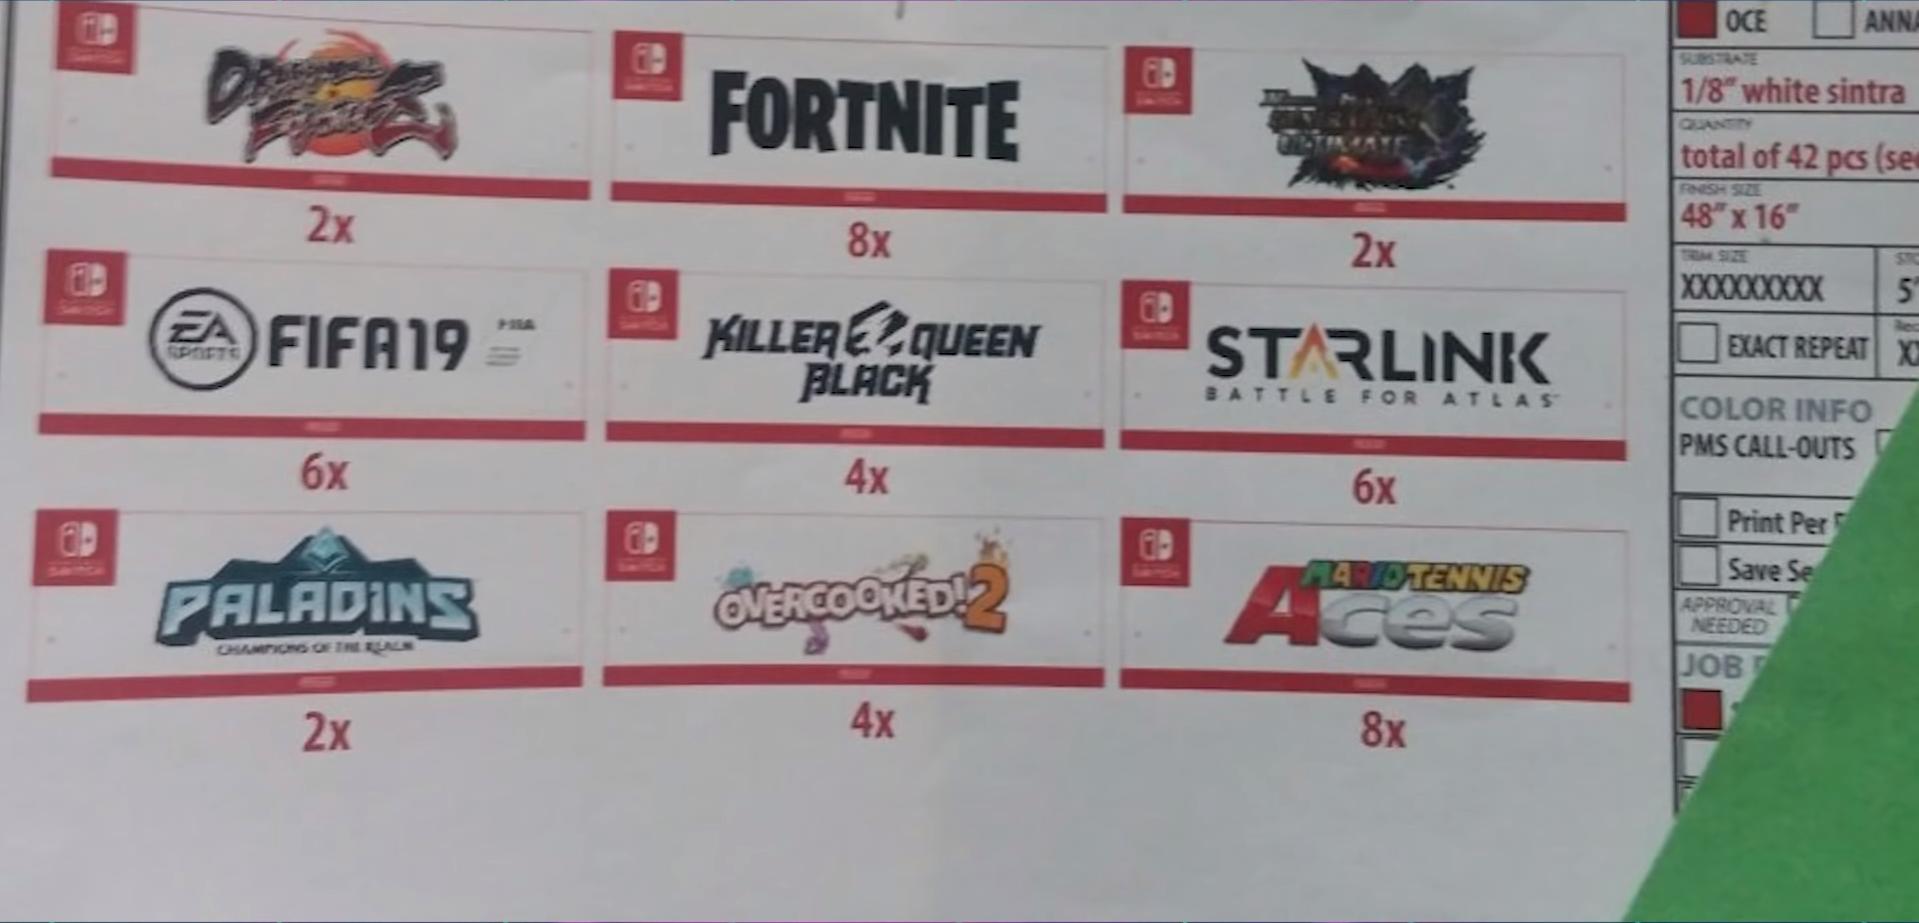 Nintendo בתערוכת E3 2018 - הדלפות